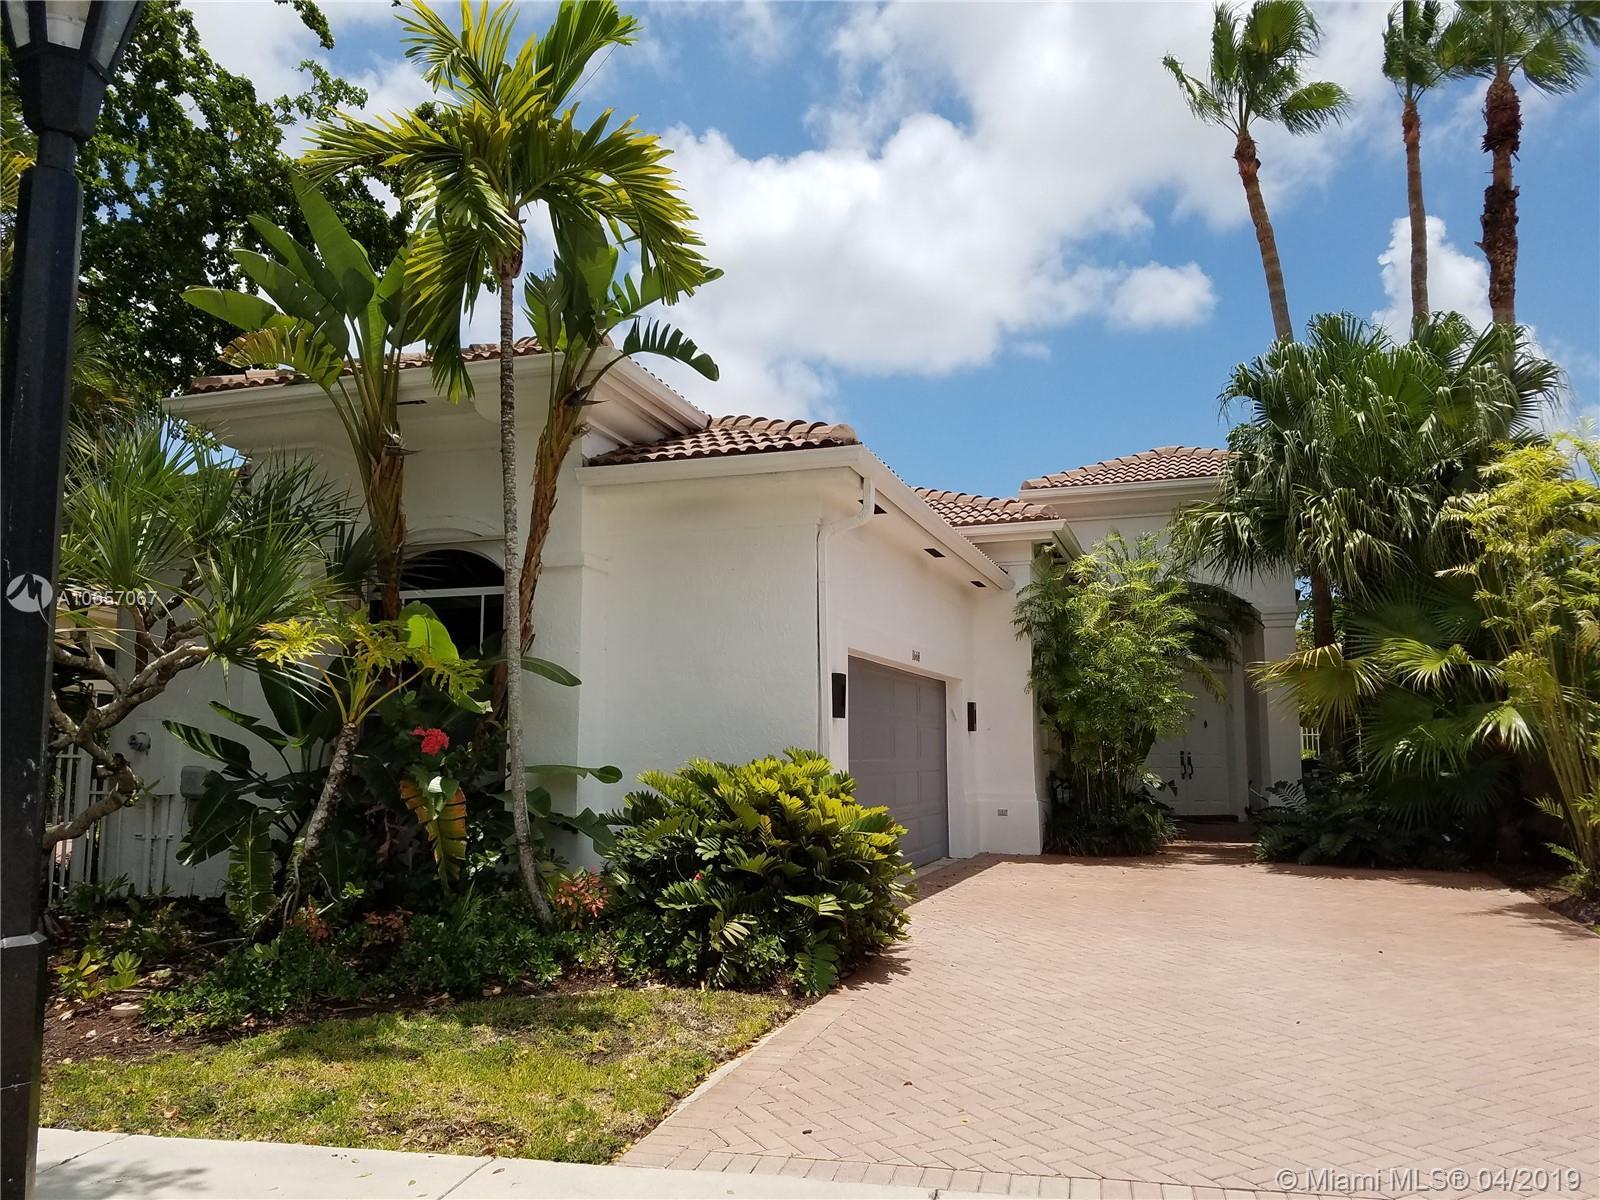 1668 Diplomat Dr, Miami, FL 33179